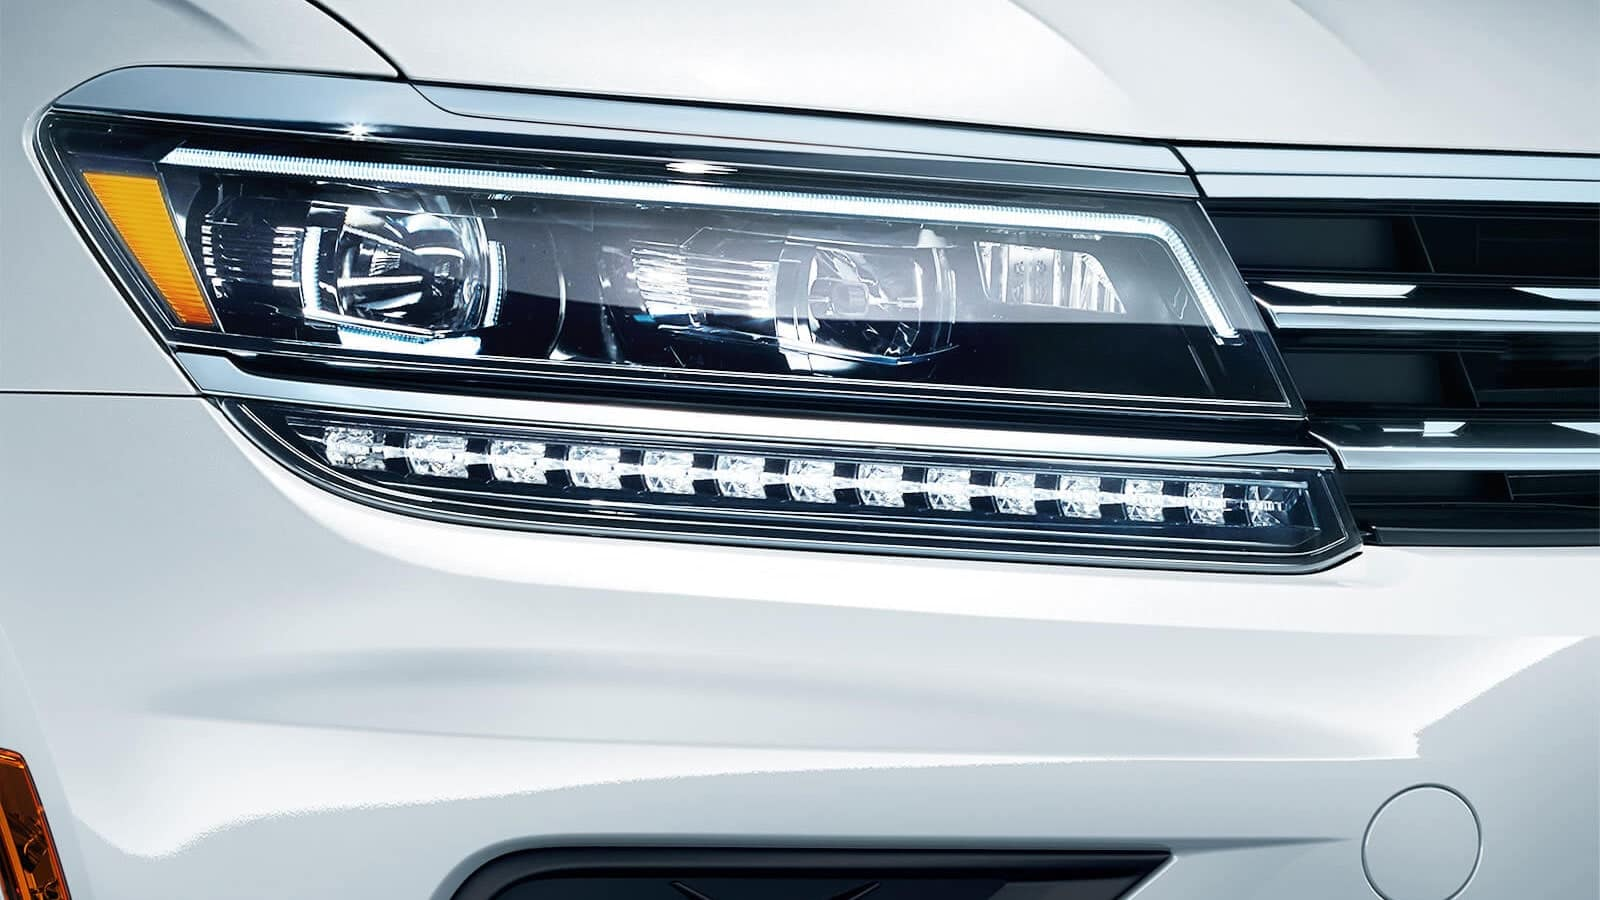 2019 VW Tiguan LED lights